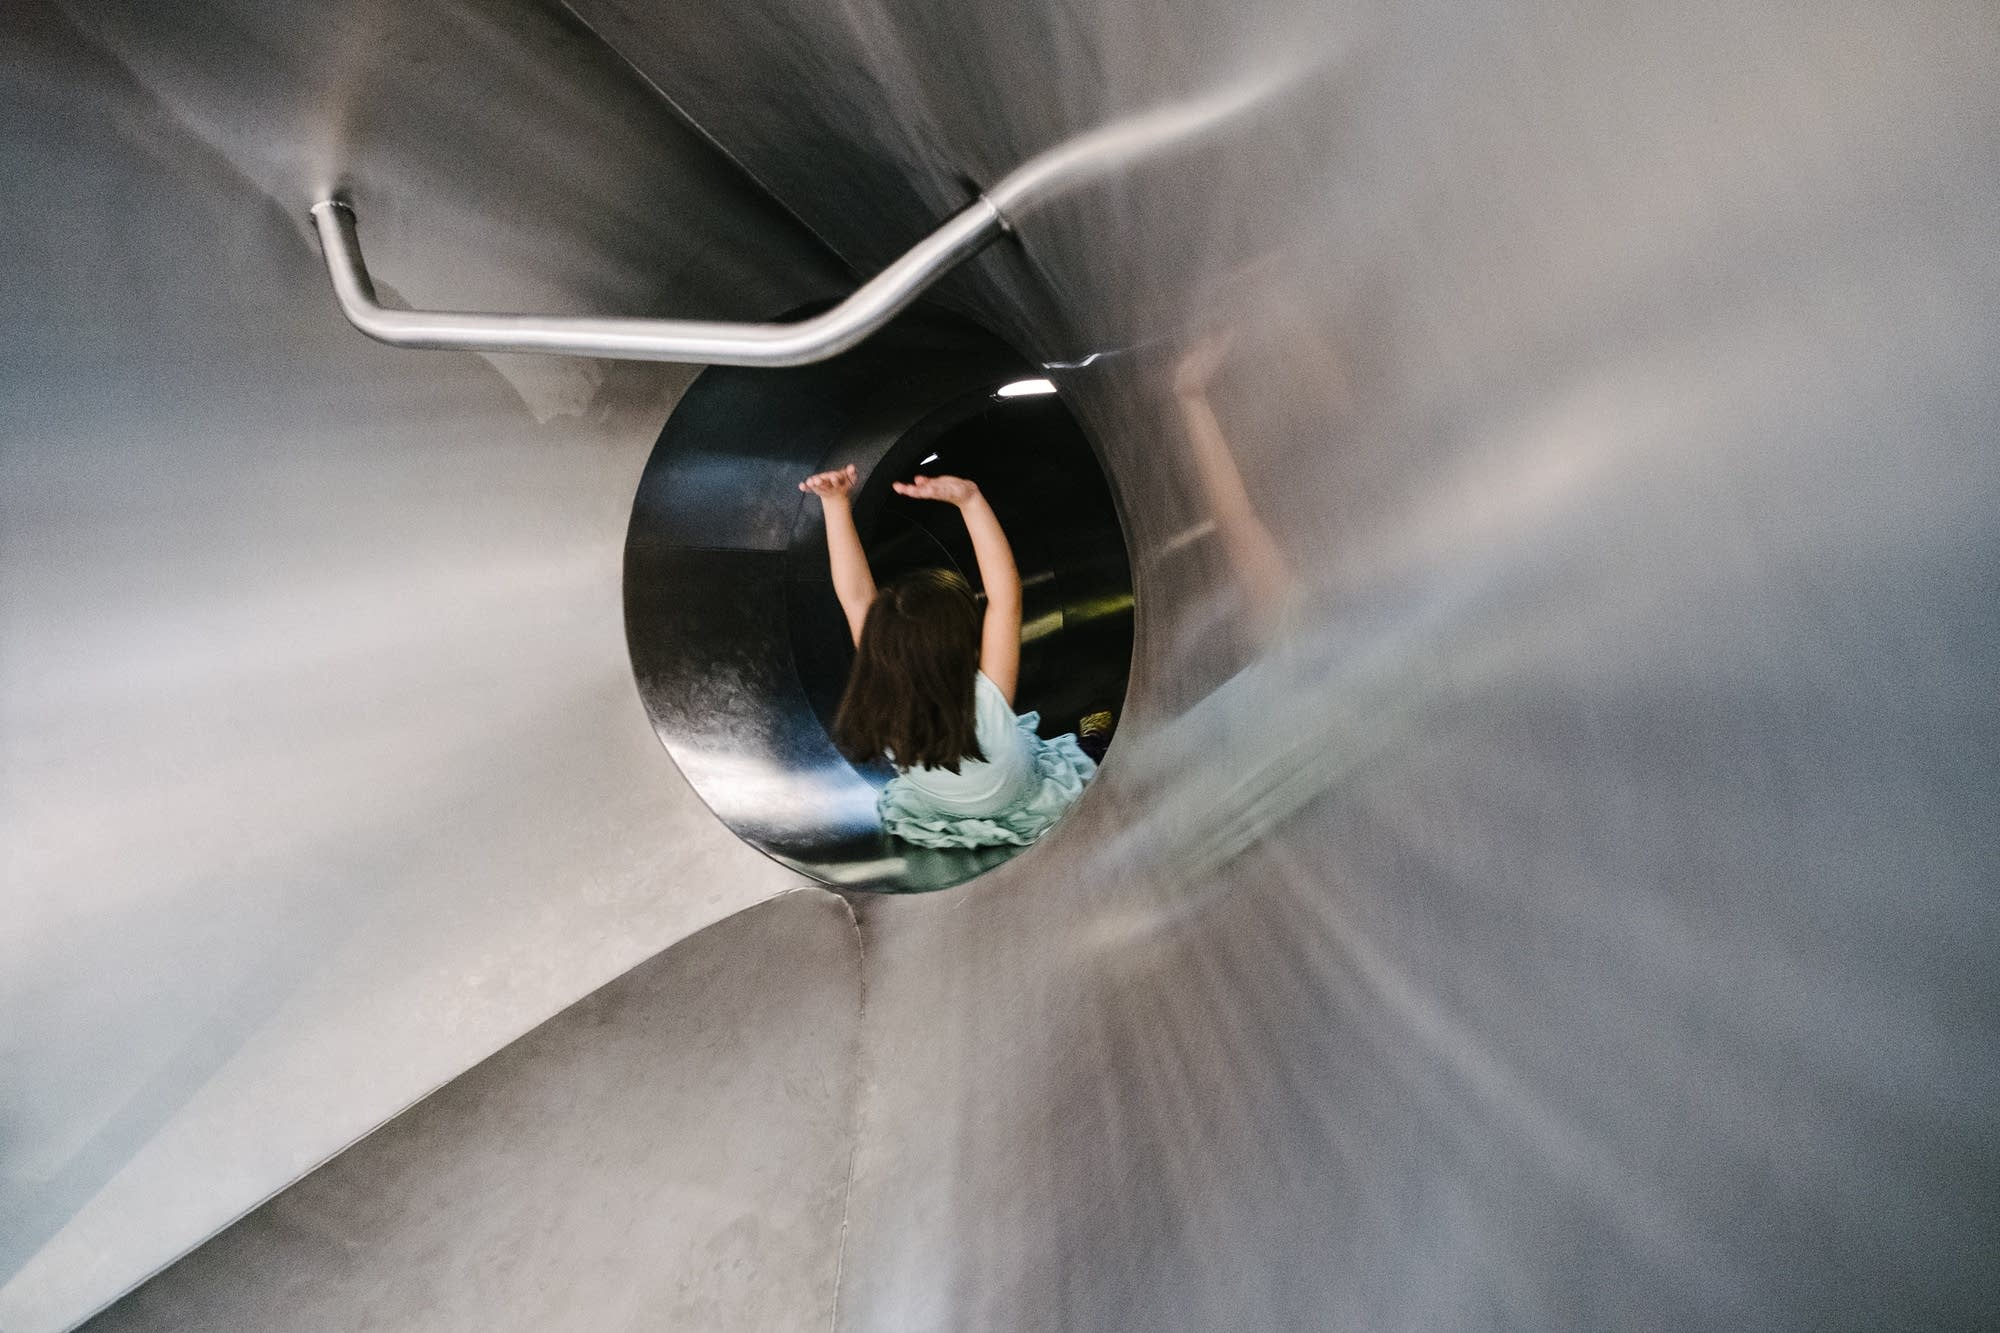 5-year-old Ava Tjelmeland rides the slide.